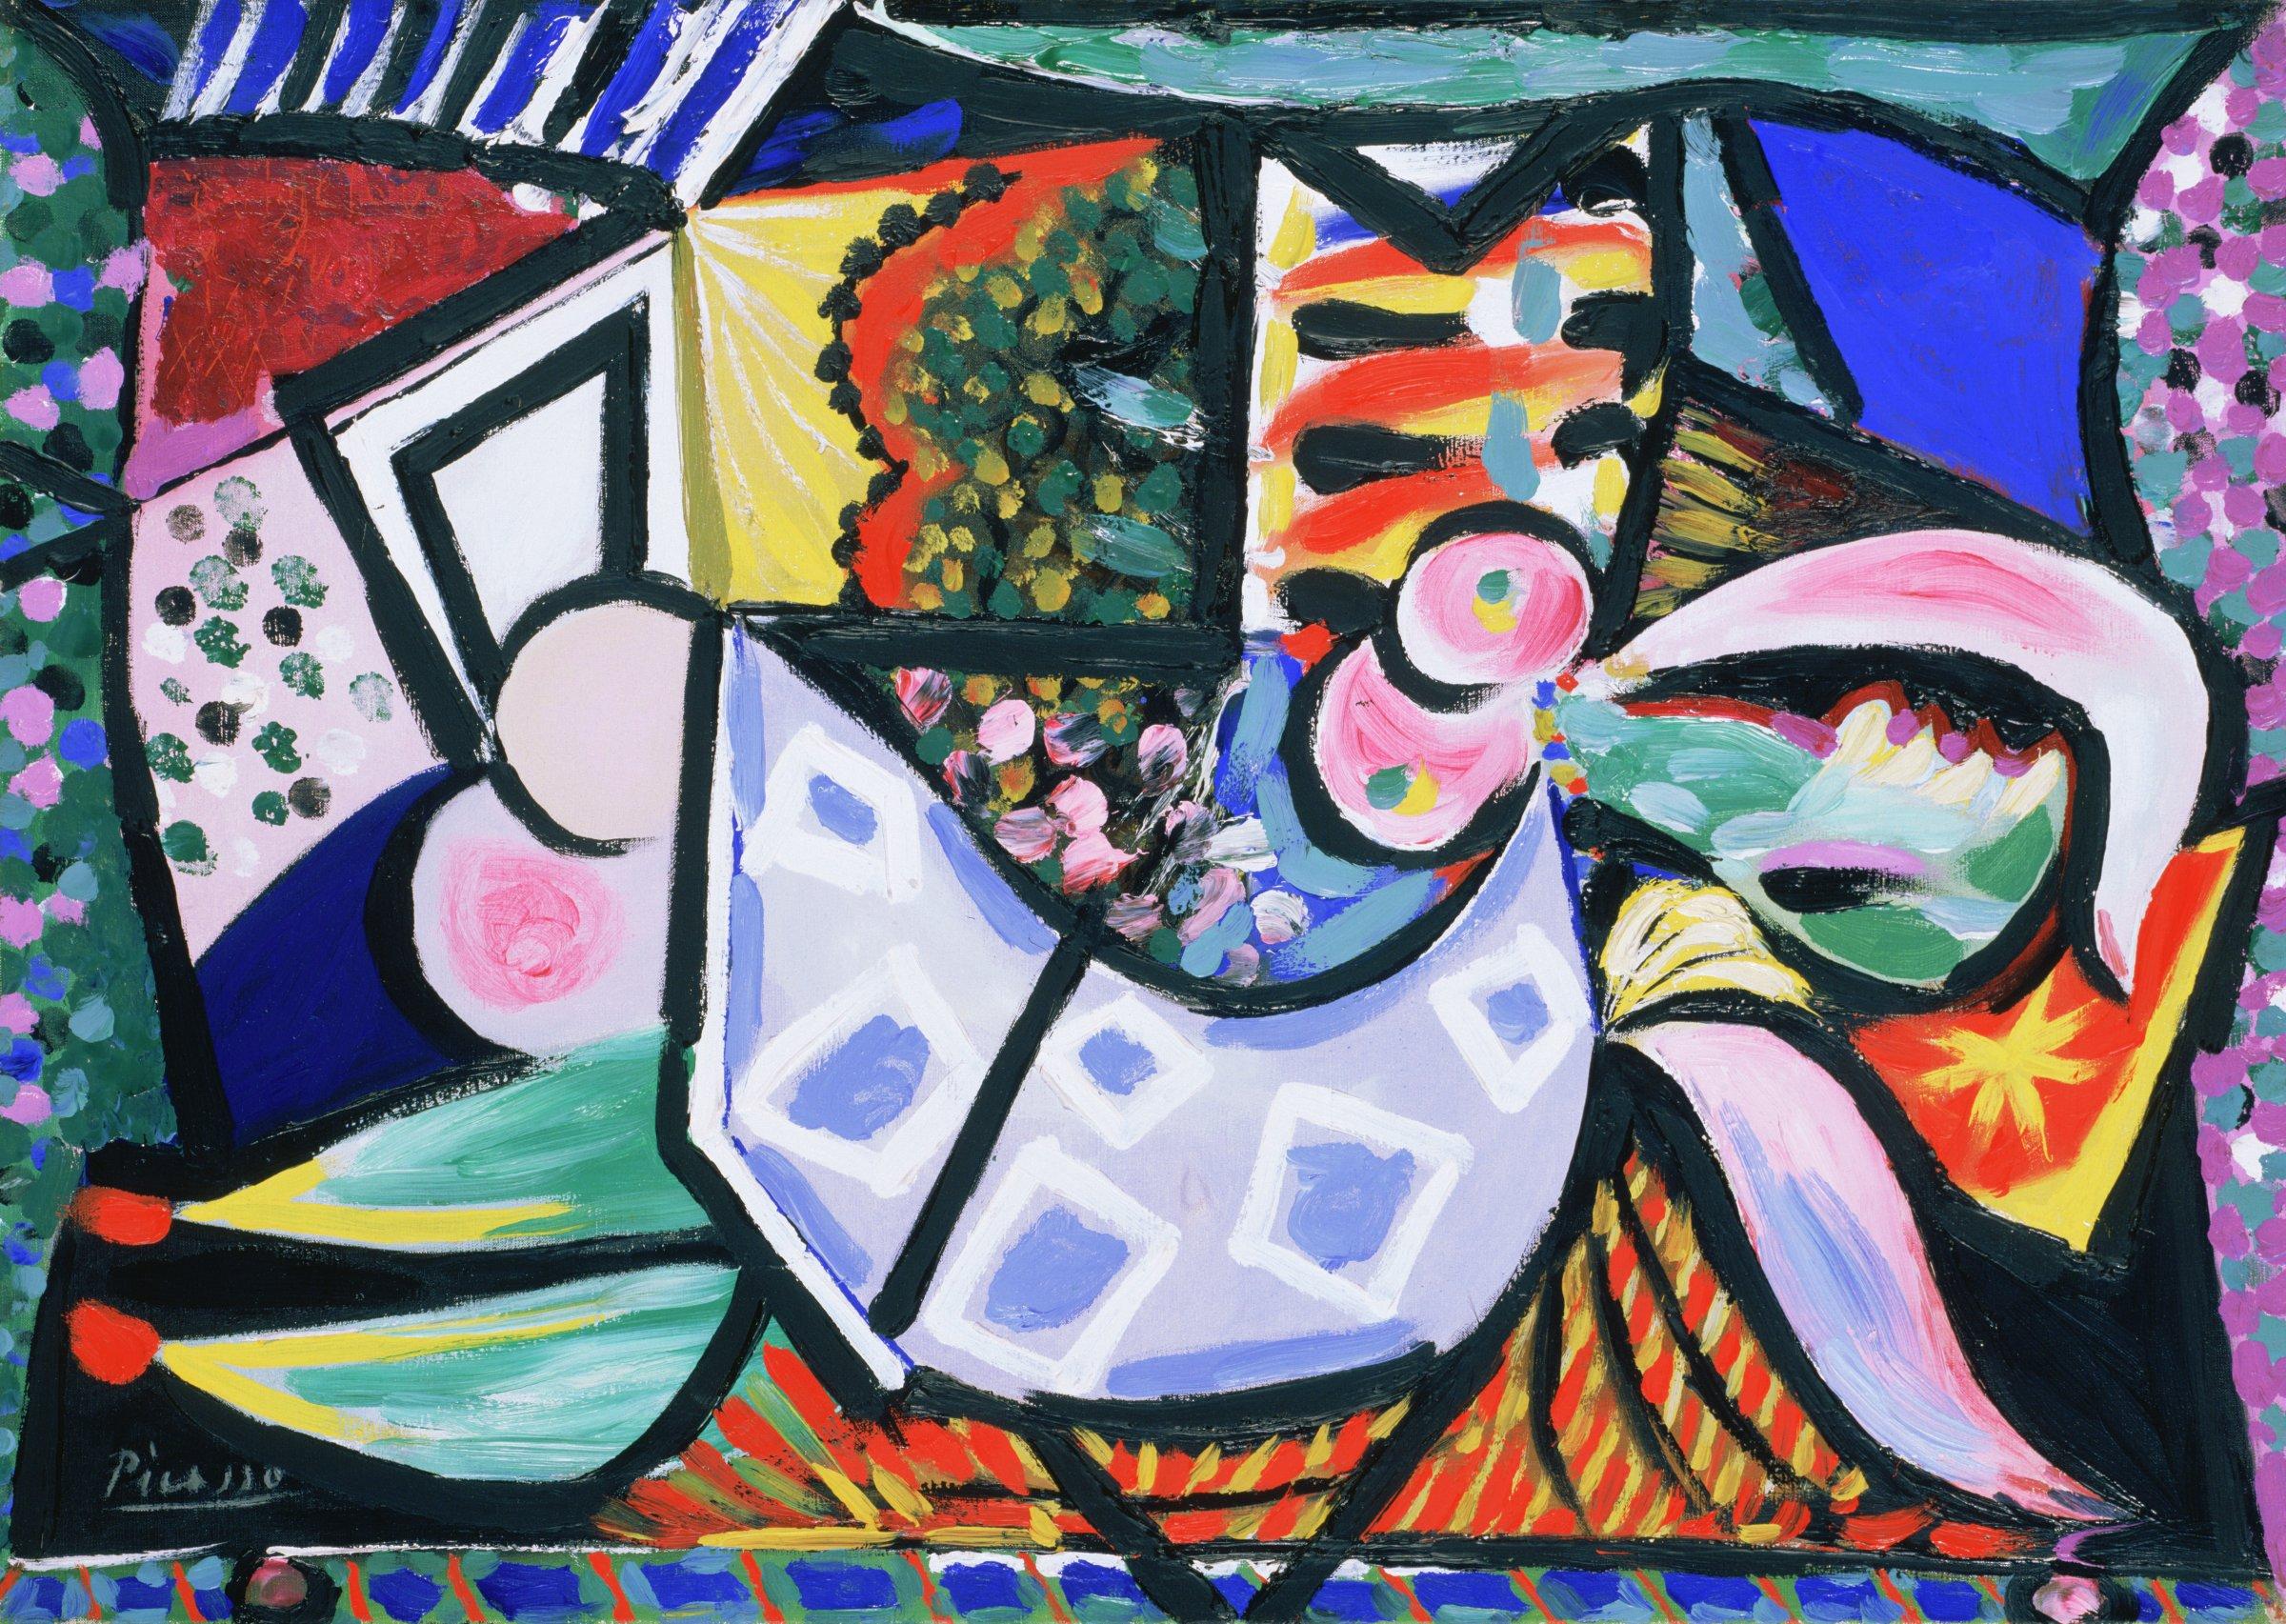 ModVis 063_Picasso_Reclining Figure crop_o2.jpg